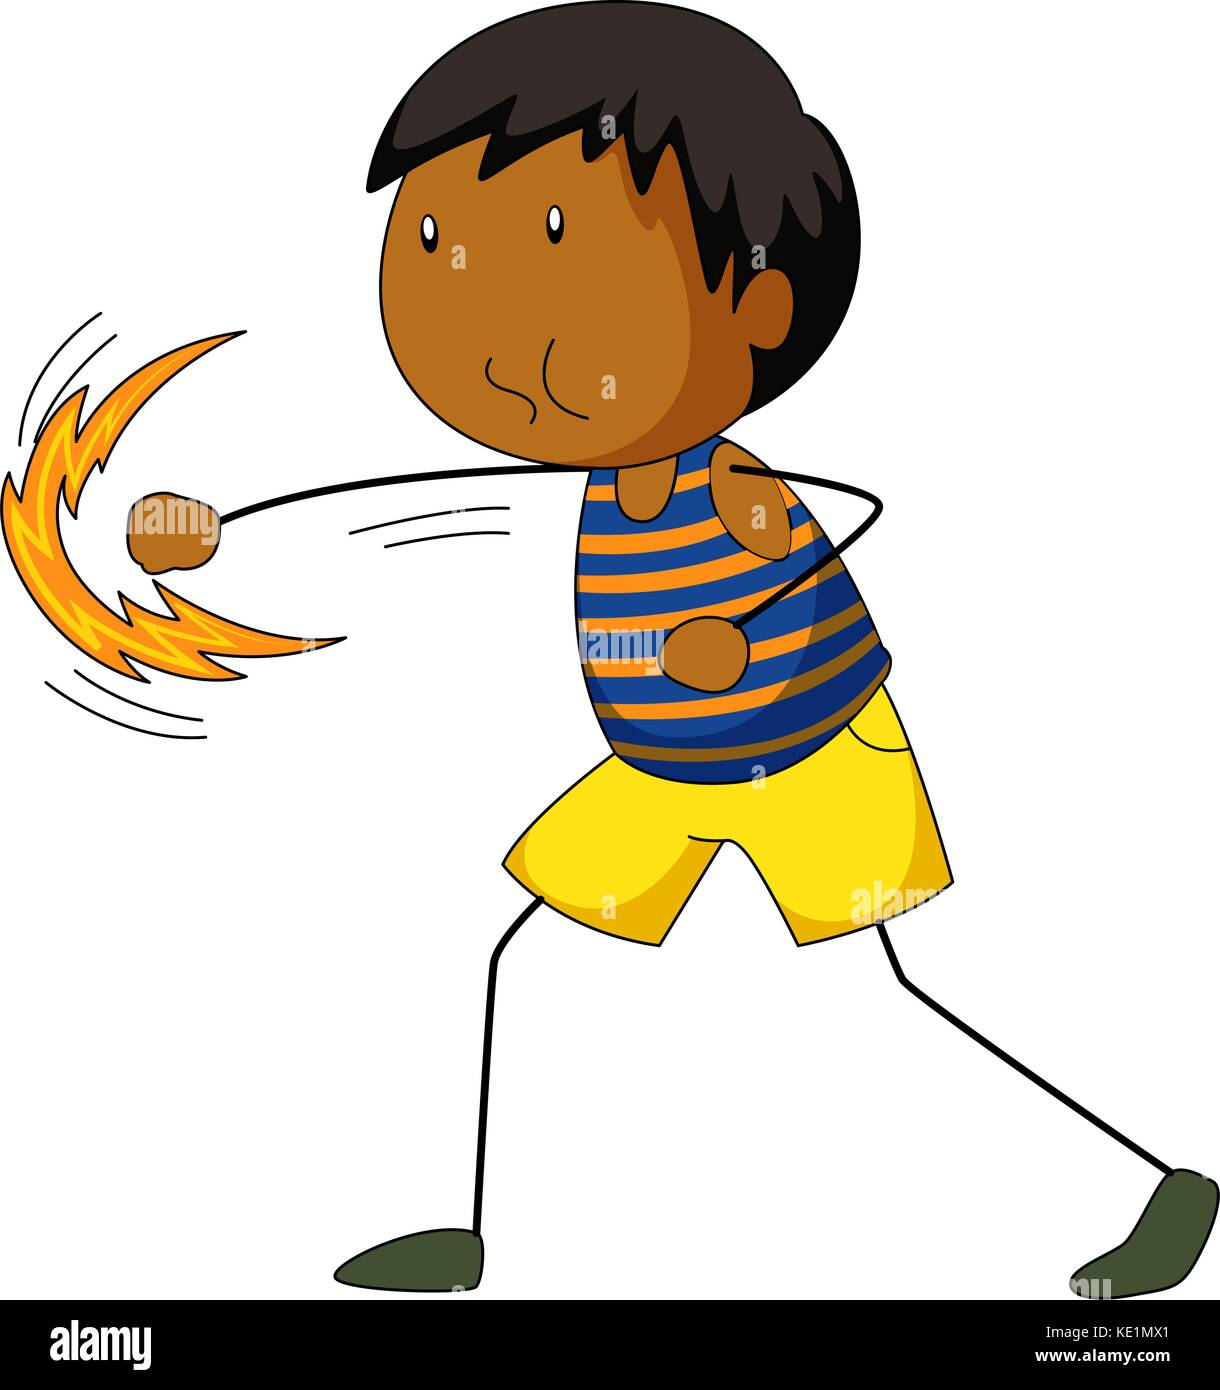 Little boy punching air illustration - Stock Vector